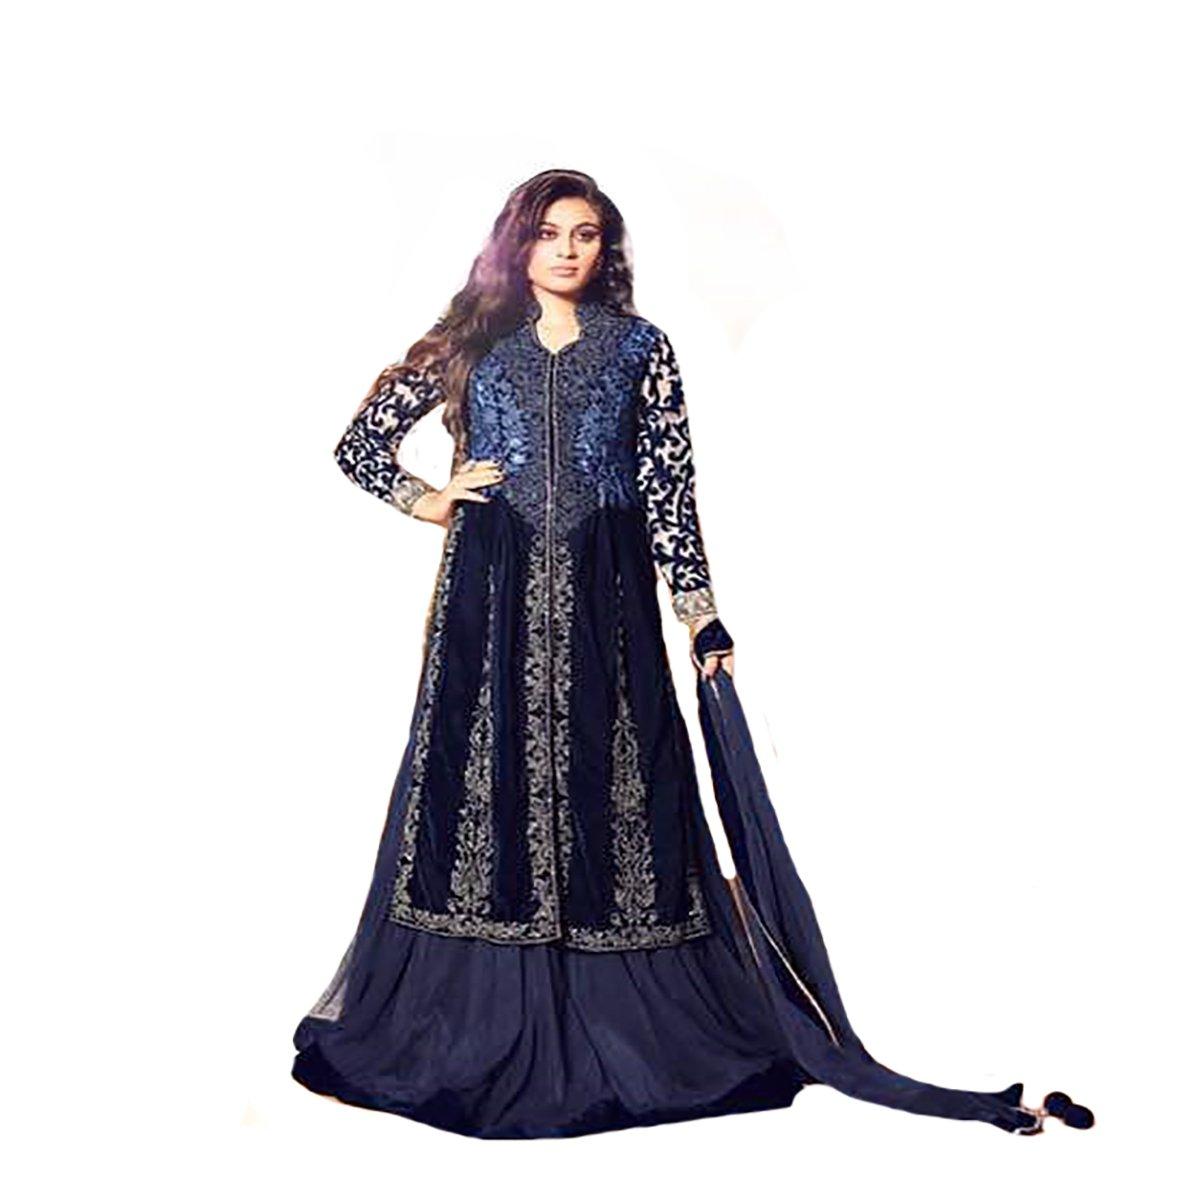 Bollywood 100% Original Ethnic Gown Anarkali Salwar Kameez suit Ceremony Muslim 8806